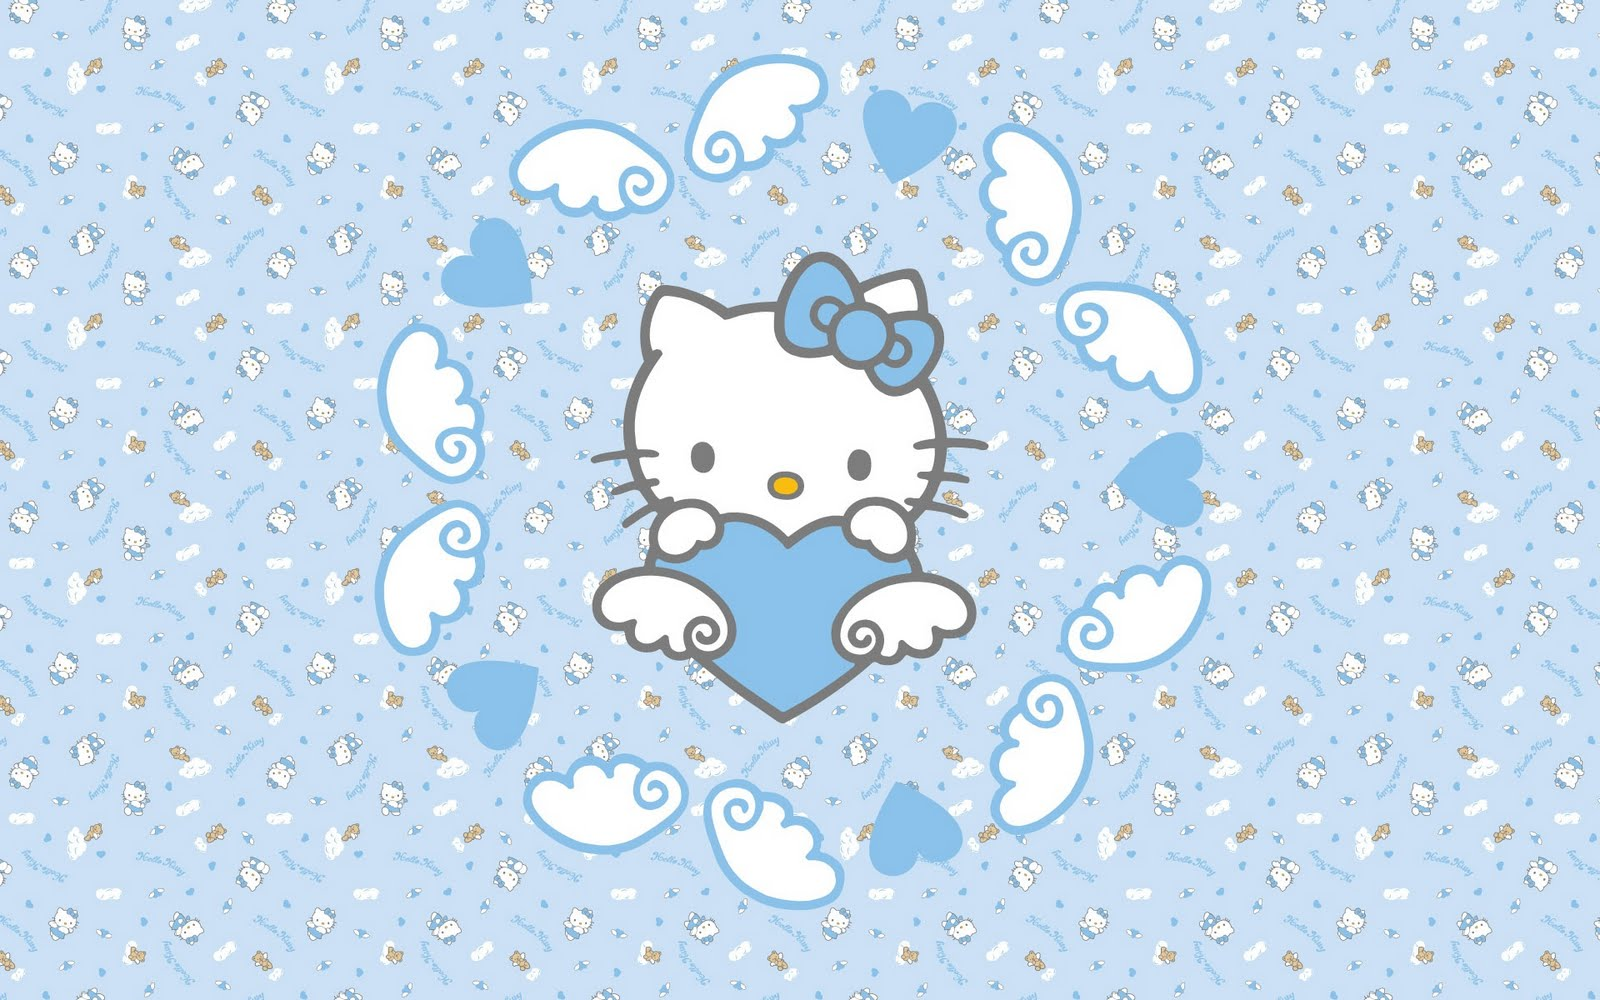 Cute Hello Kitty Wallpaper For Widescreen Desktop And Notebook